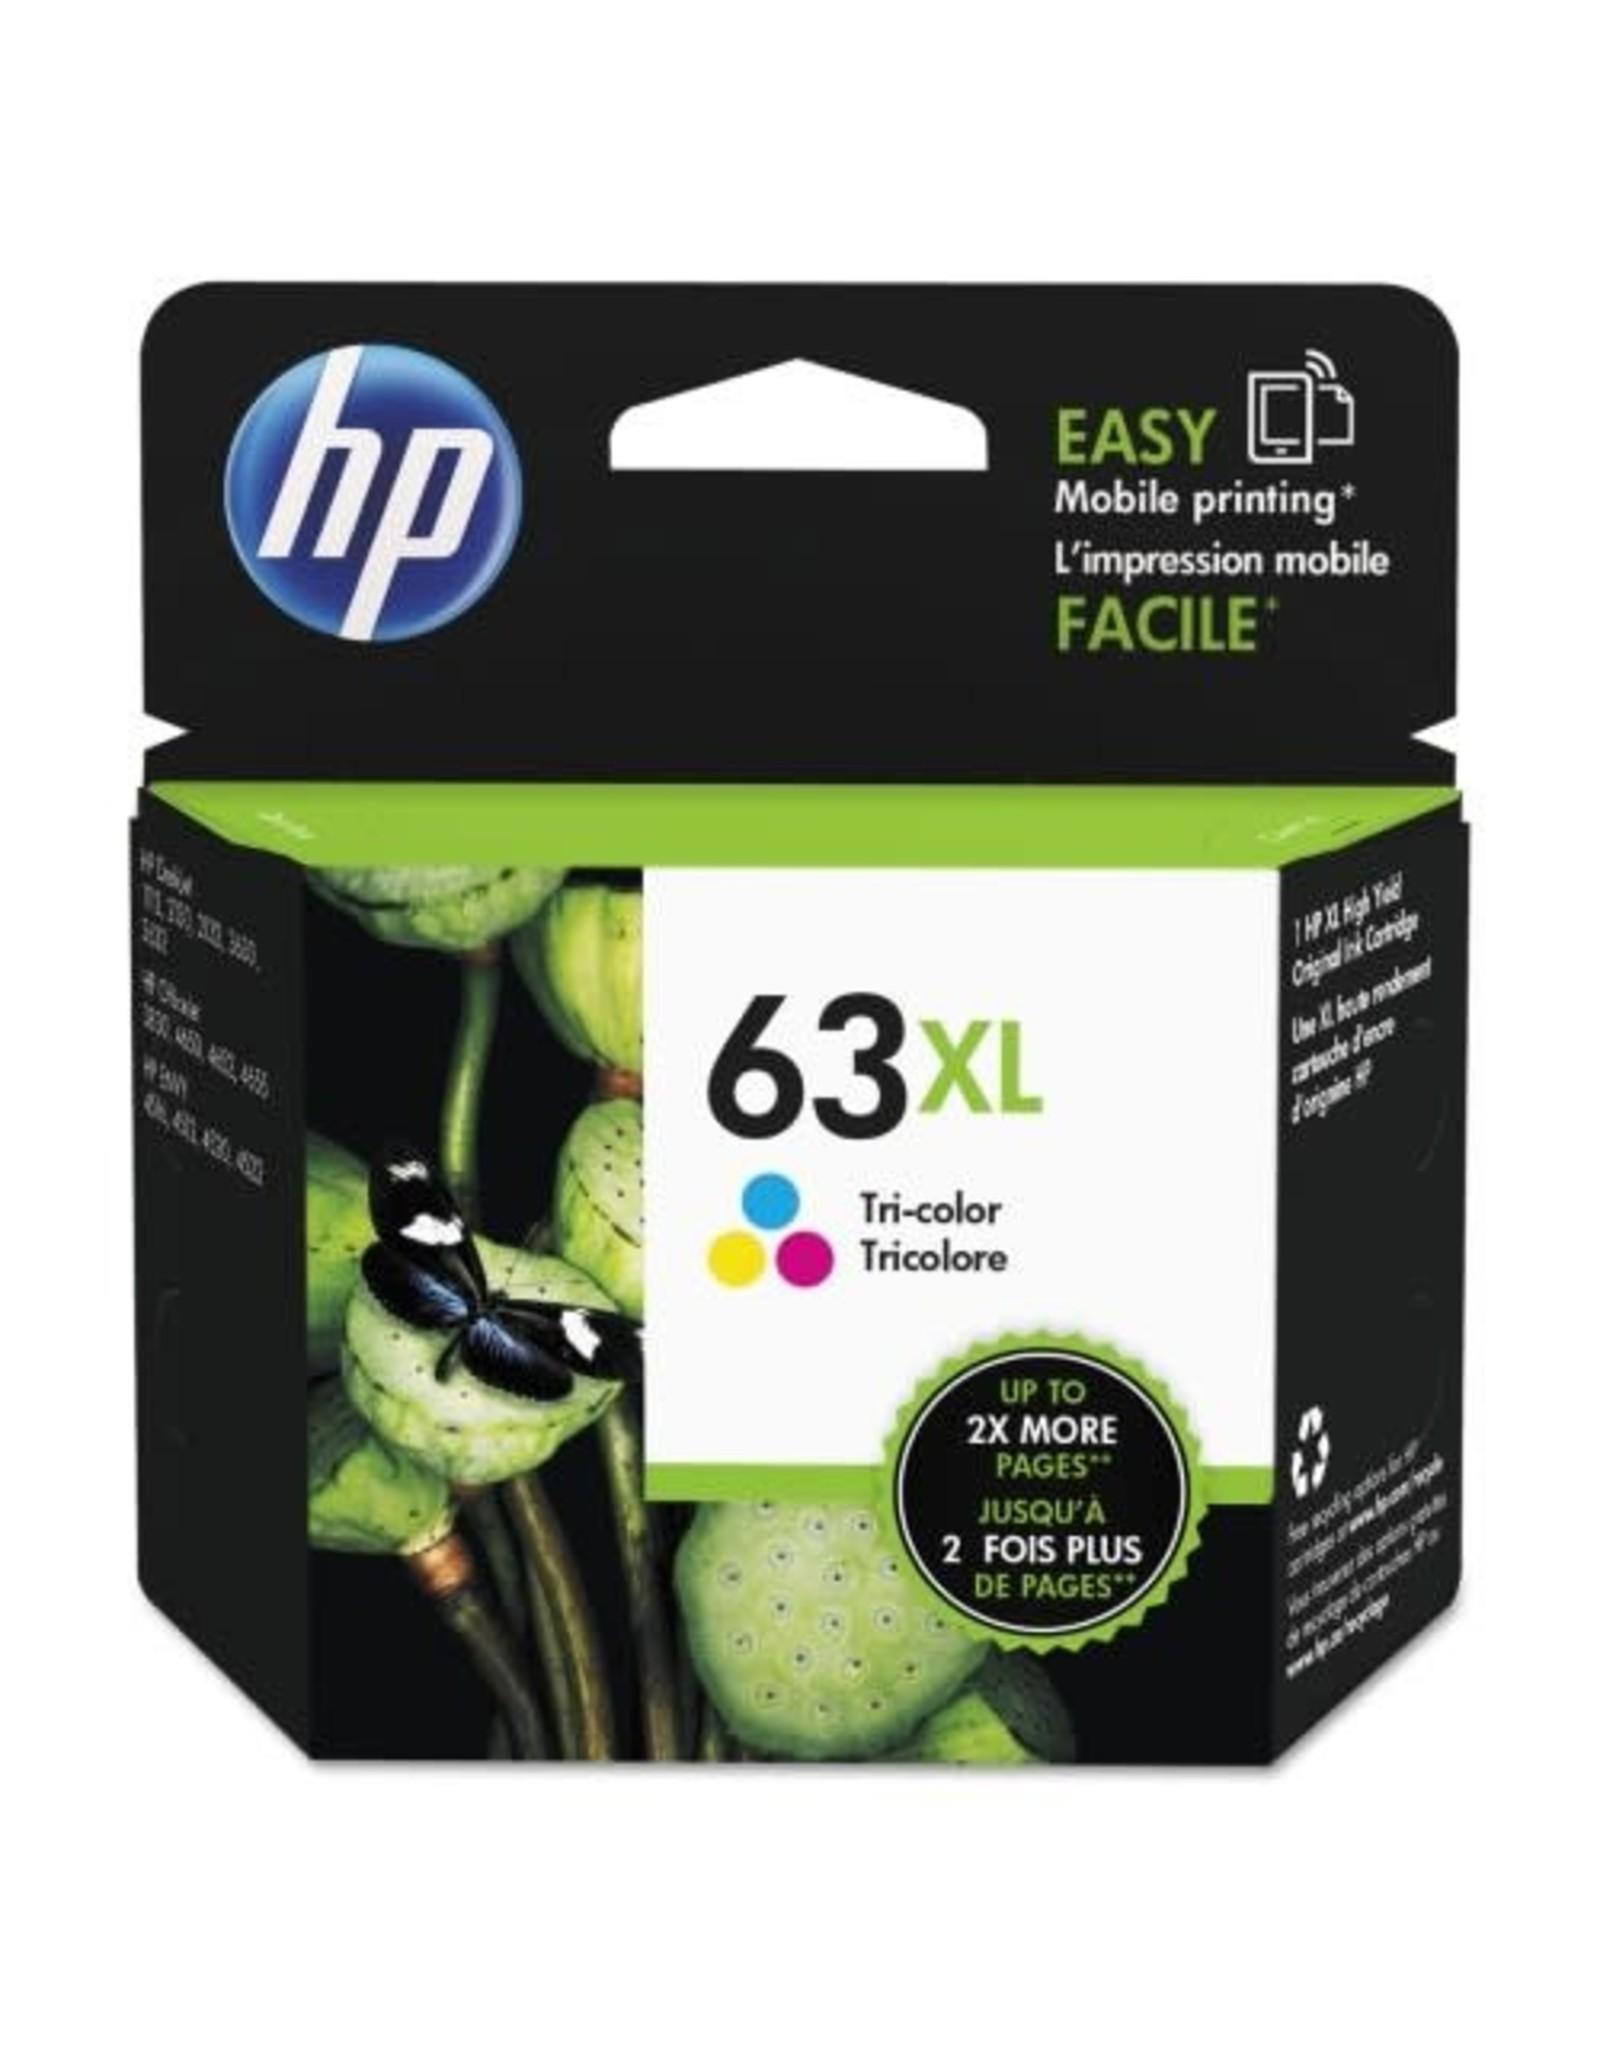 HP INKJET CARTRIDGE-HP #63XL COLOUR HIGH YIELD